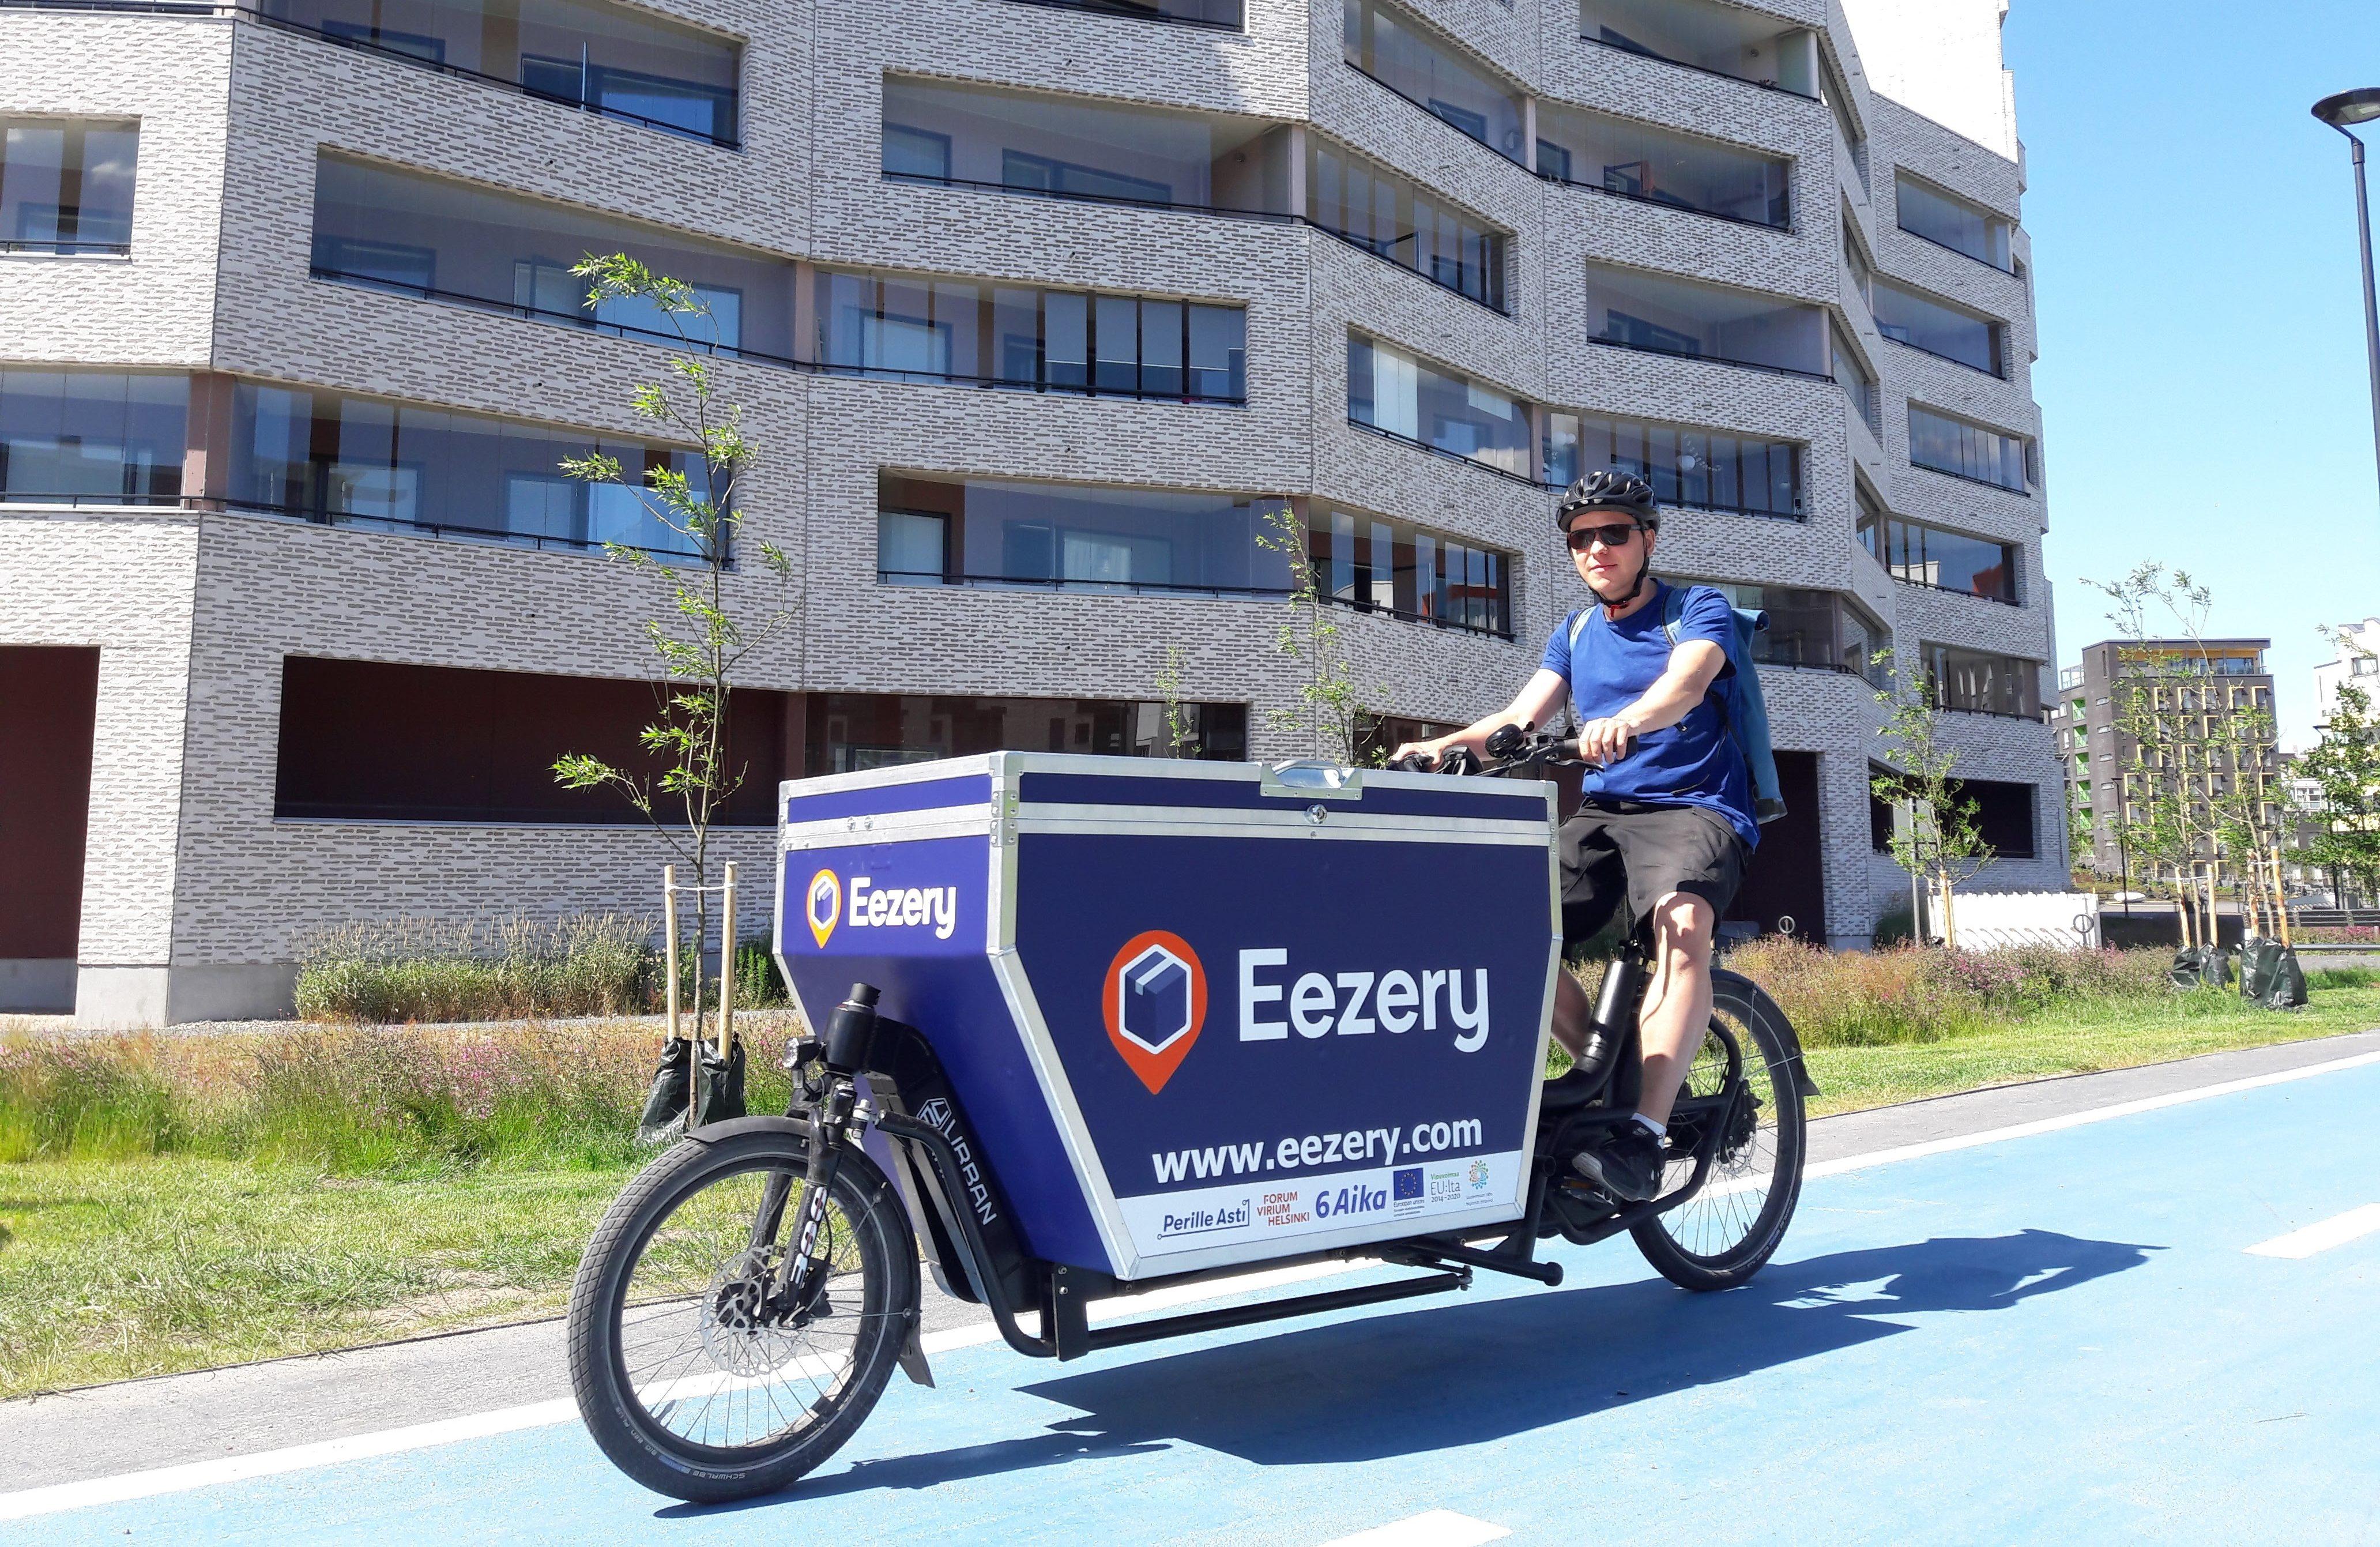 Eezery cargo bikes